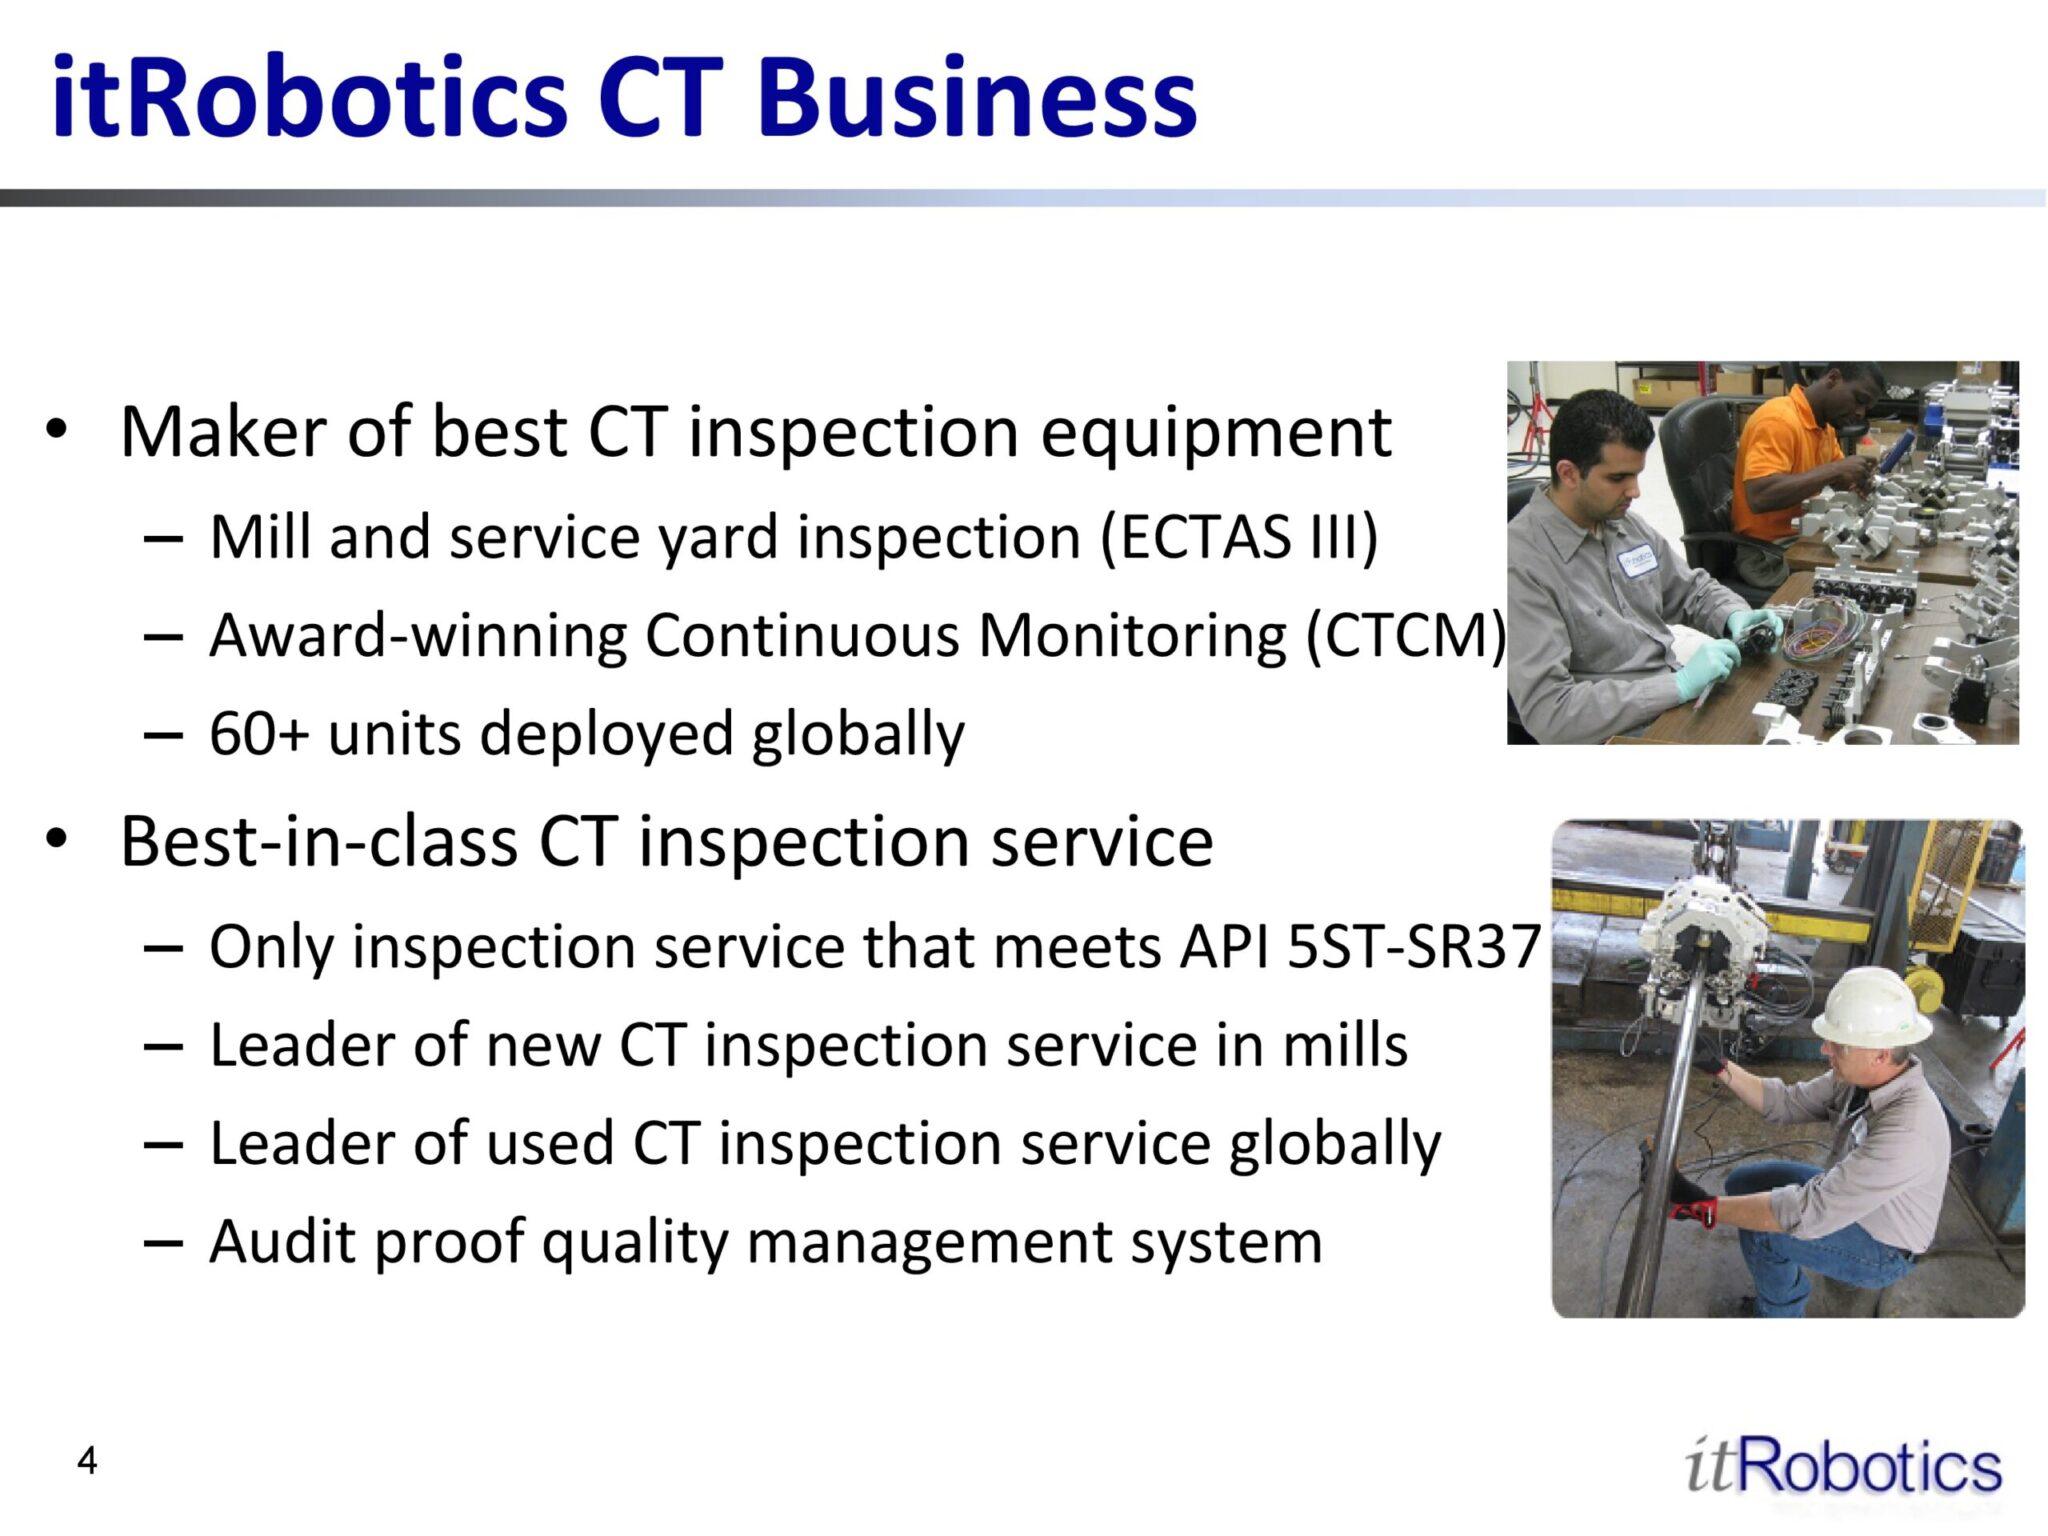 iRobotics CT Business